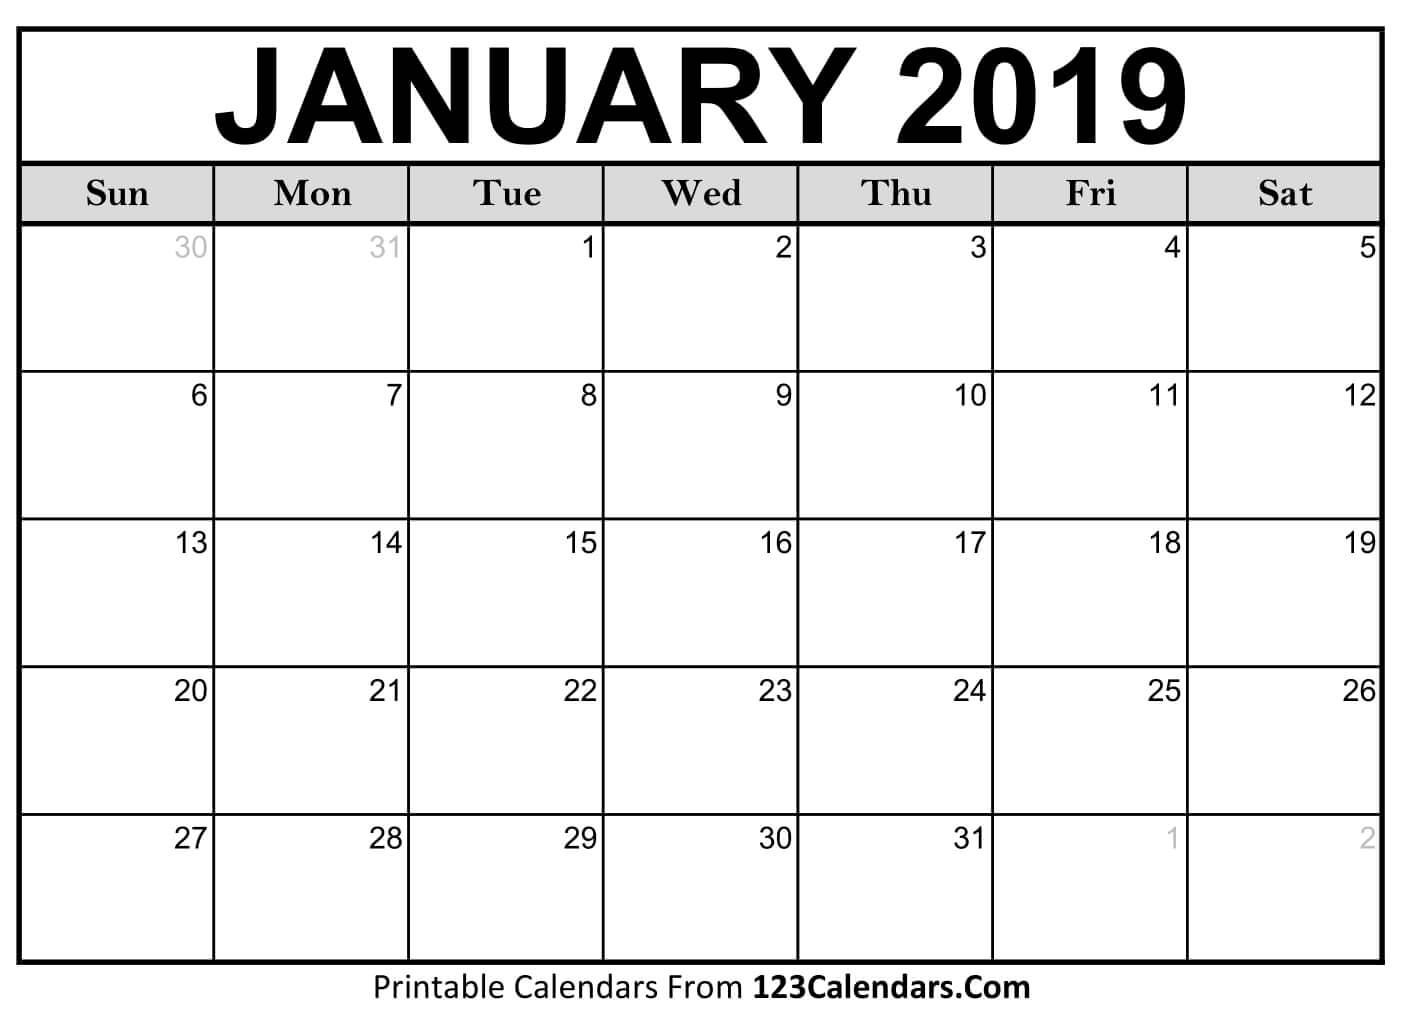 Jan 2019 Calendar Printable